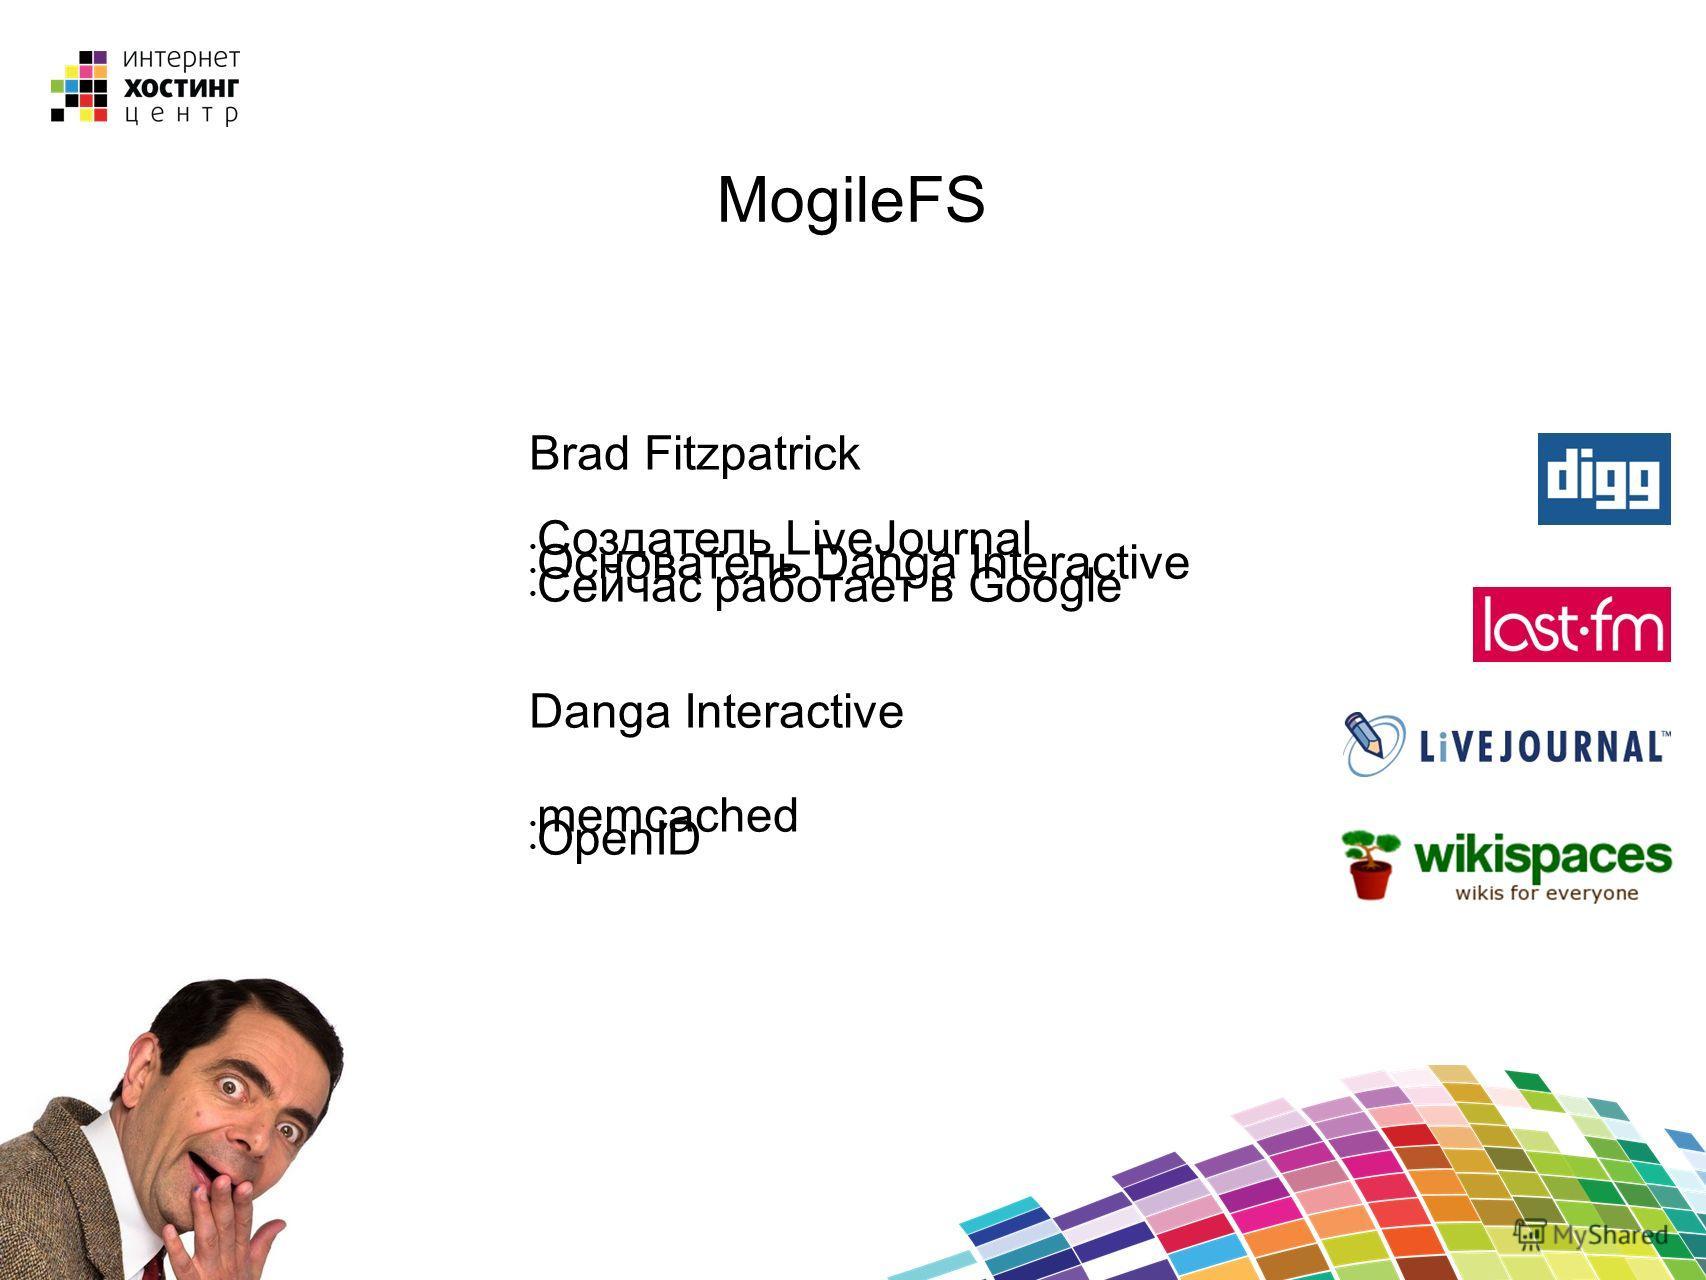 MogileFS Brad Fitzpatrick Создатель LiveJournal Основатель Danga Interactive Сейчас работает в Google Danga Interactive memcached OpenID